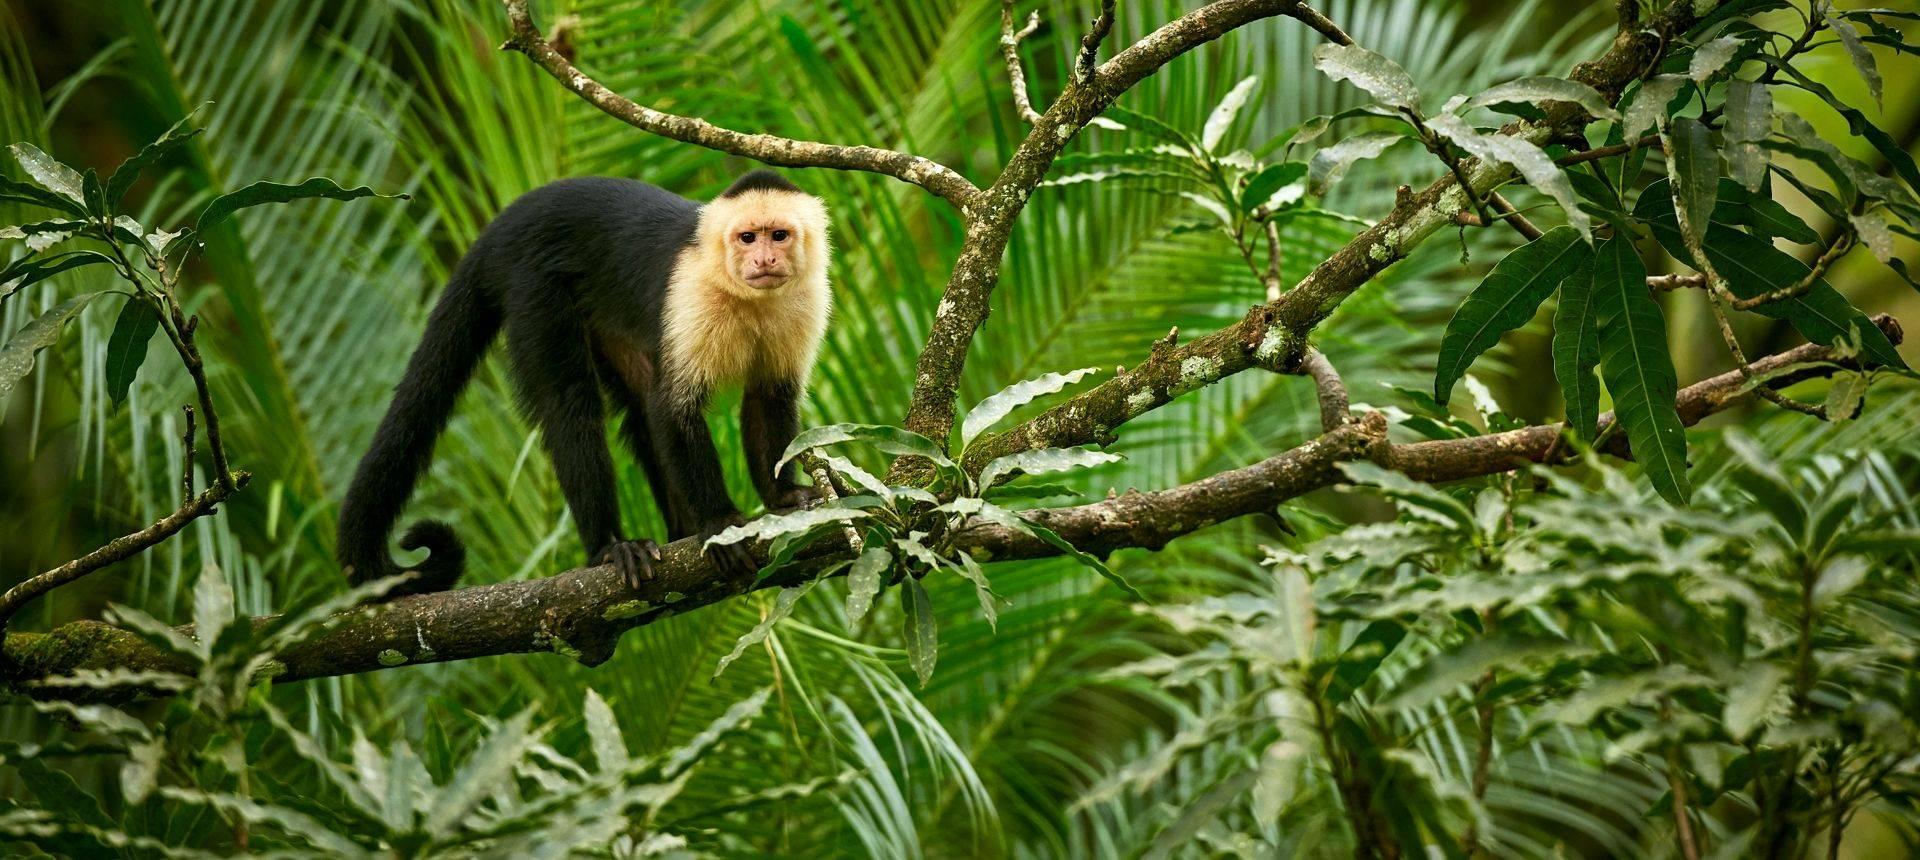 White Headed Capuchin, Costa Rica Shutterstock 1013561362